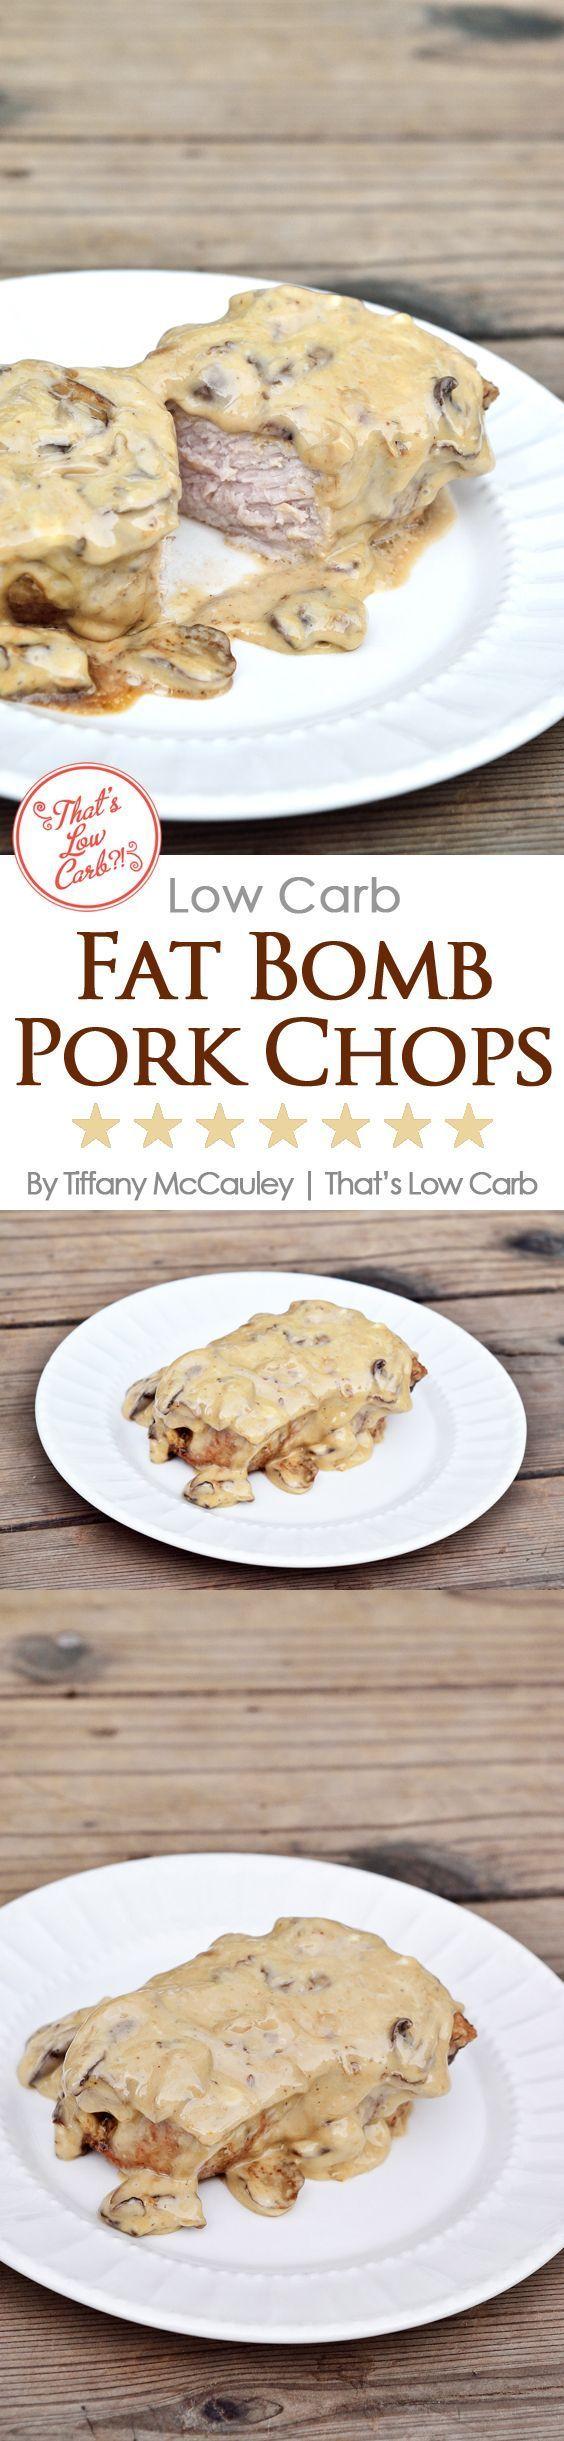 Spanakopita Calories Whole Foods